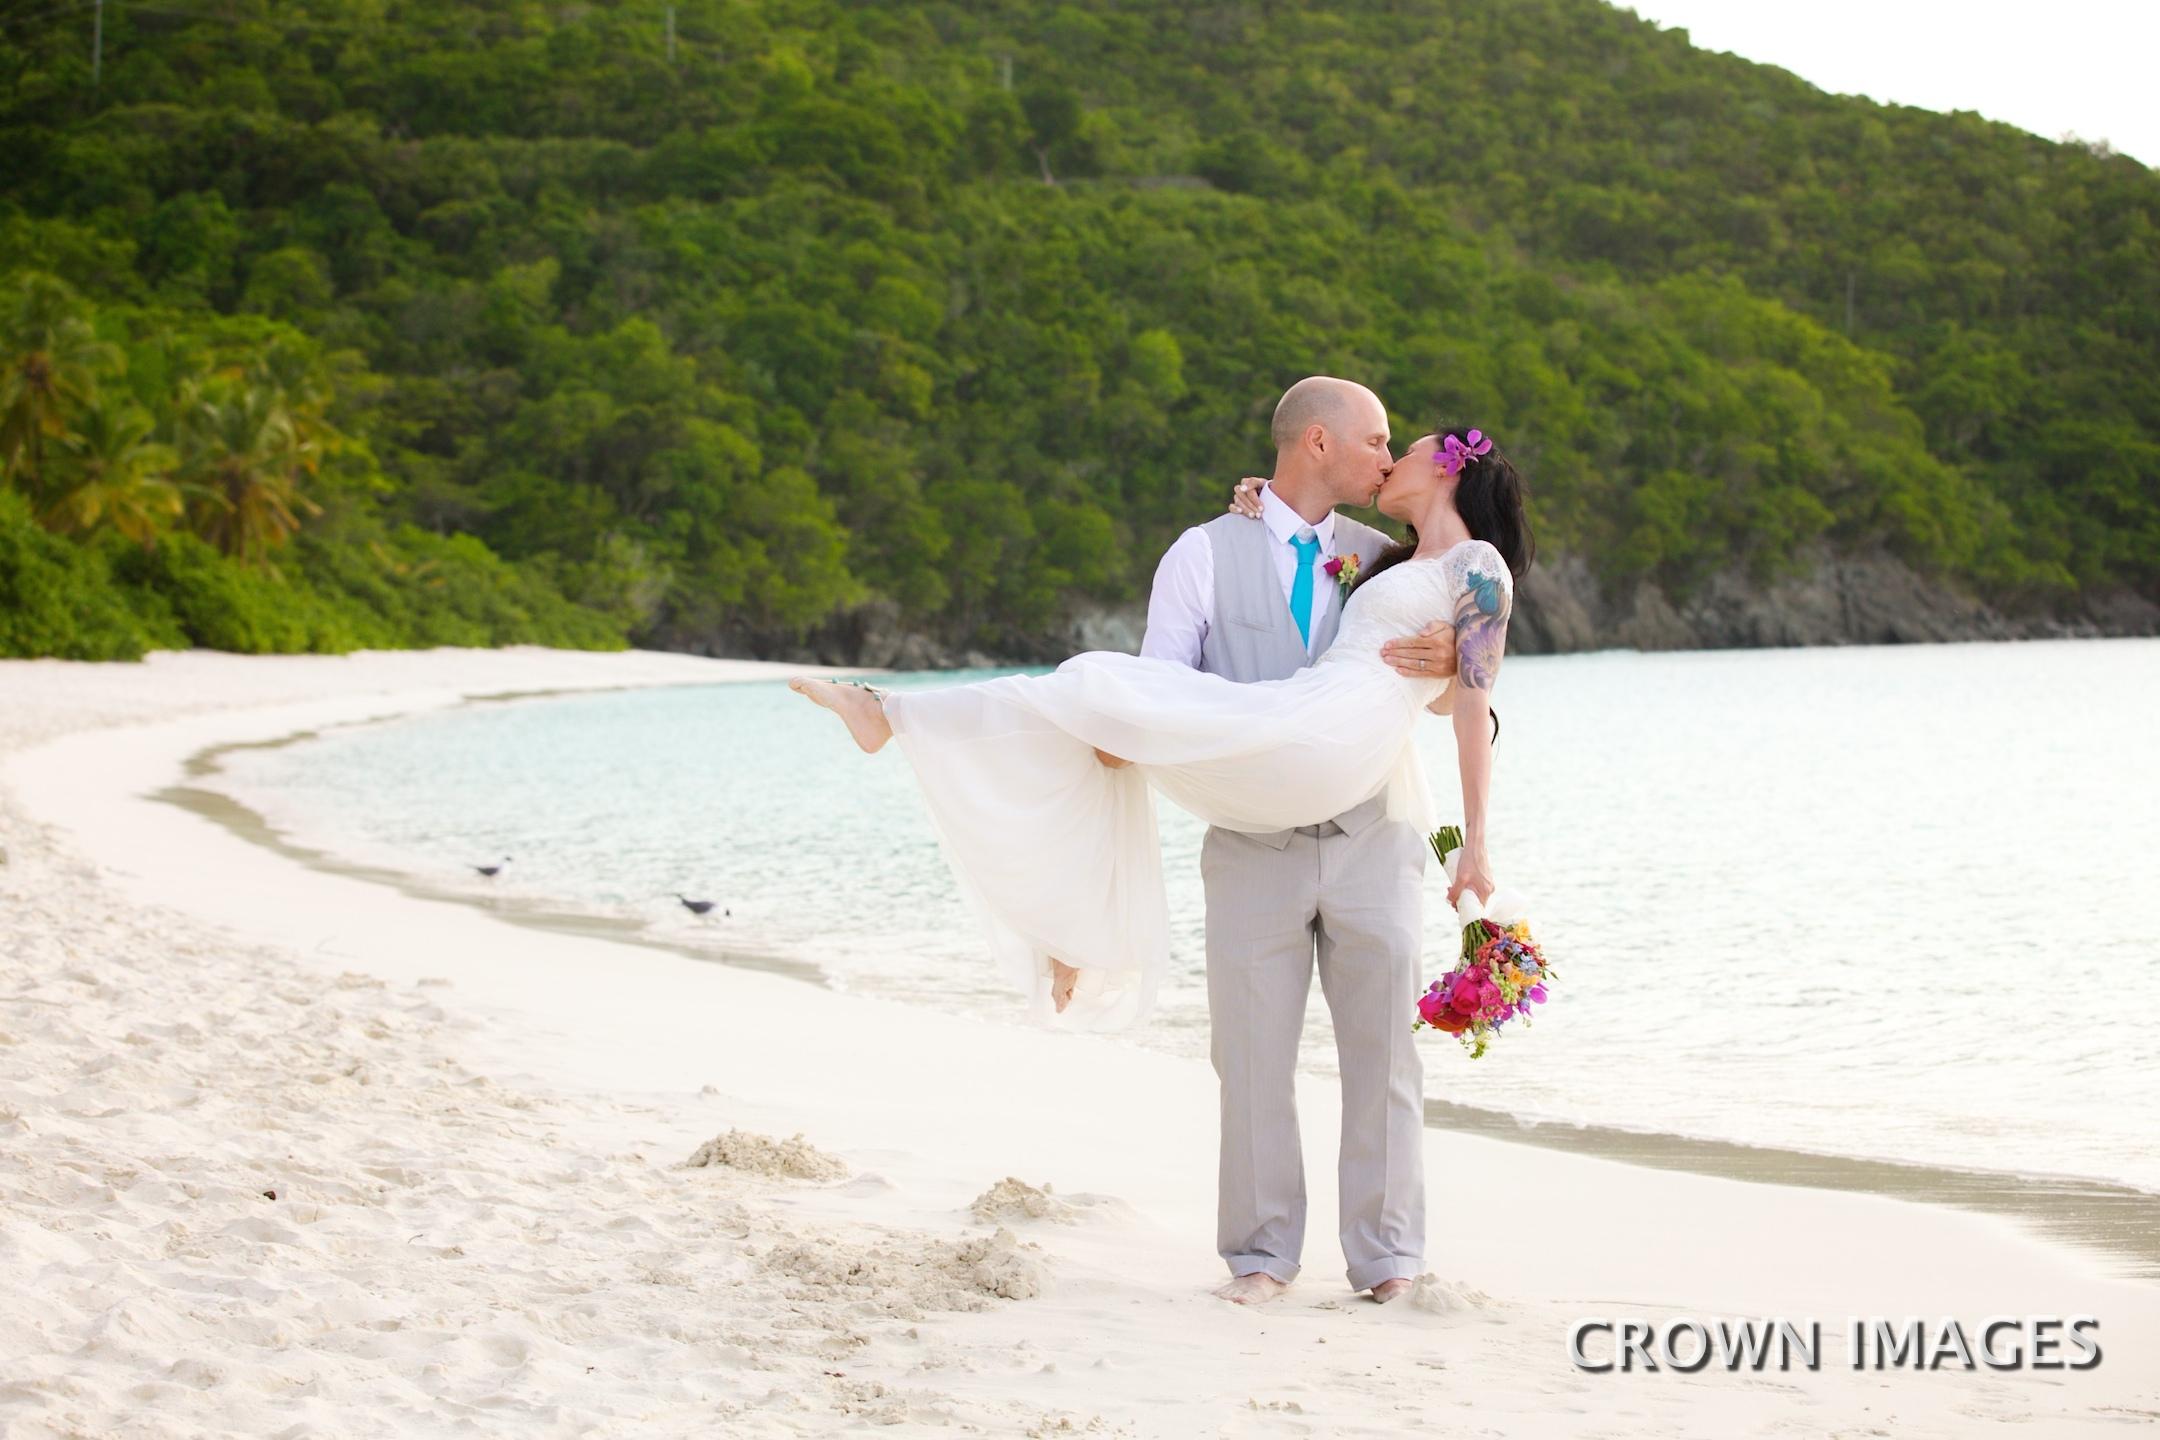 st john wedding photographer crown images